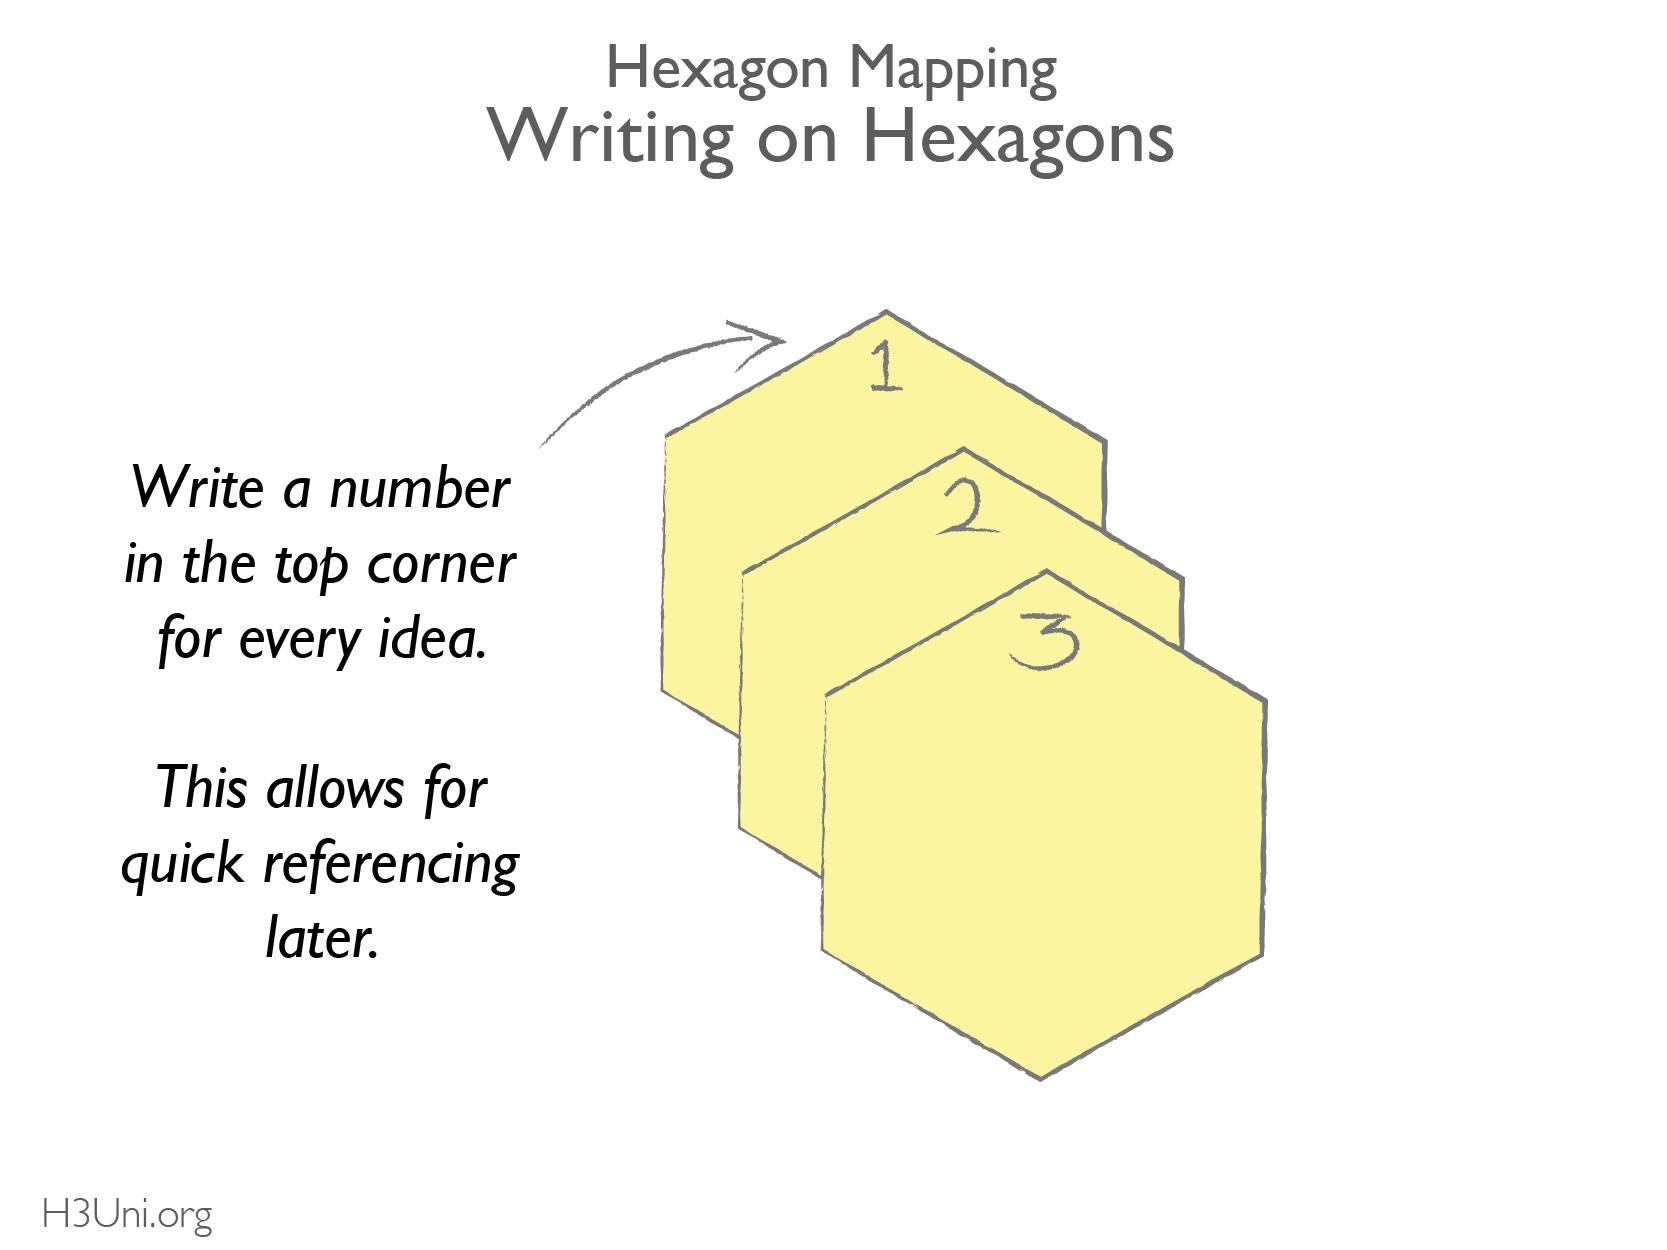 Writing on hexagons